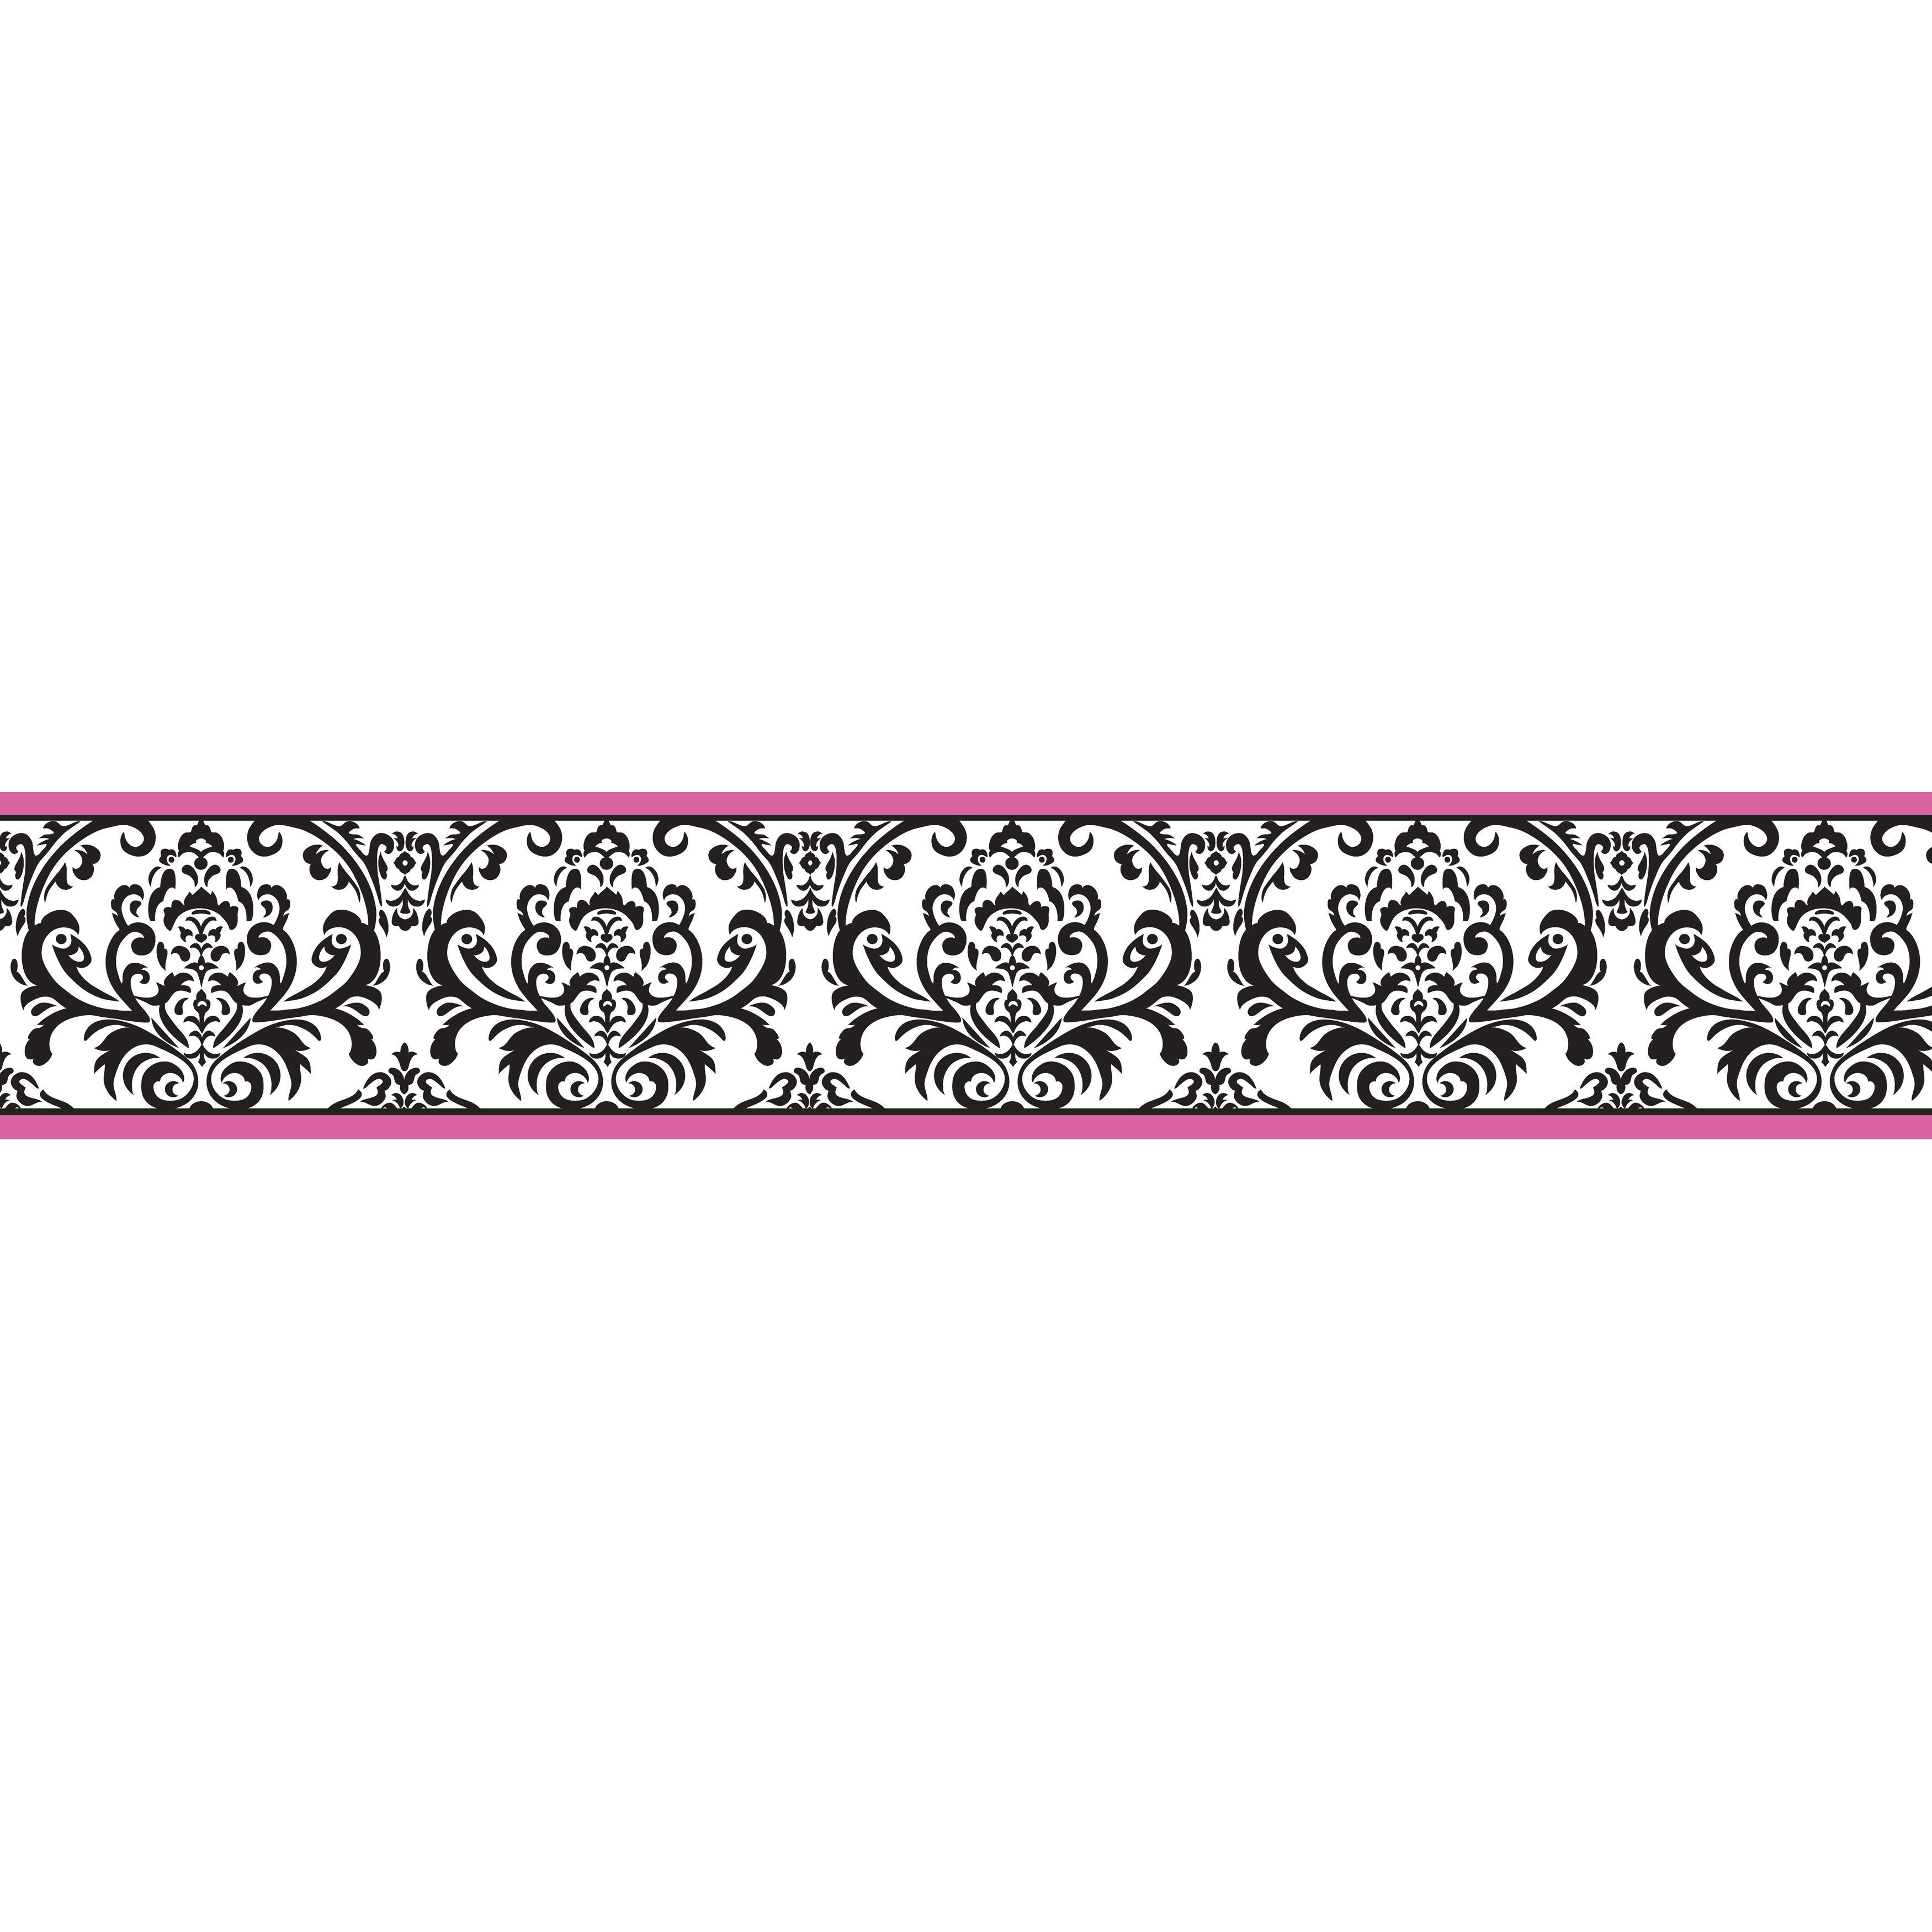 Sweet jojo designs construction zone lamp shade free shipping on - Sweet Jojo Designs Hot Pink Black And White Isabella Wall Border By Sweet Jojo Designs